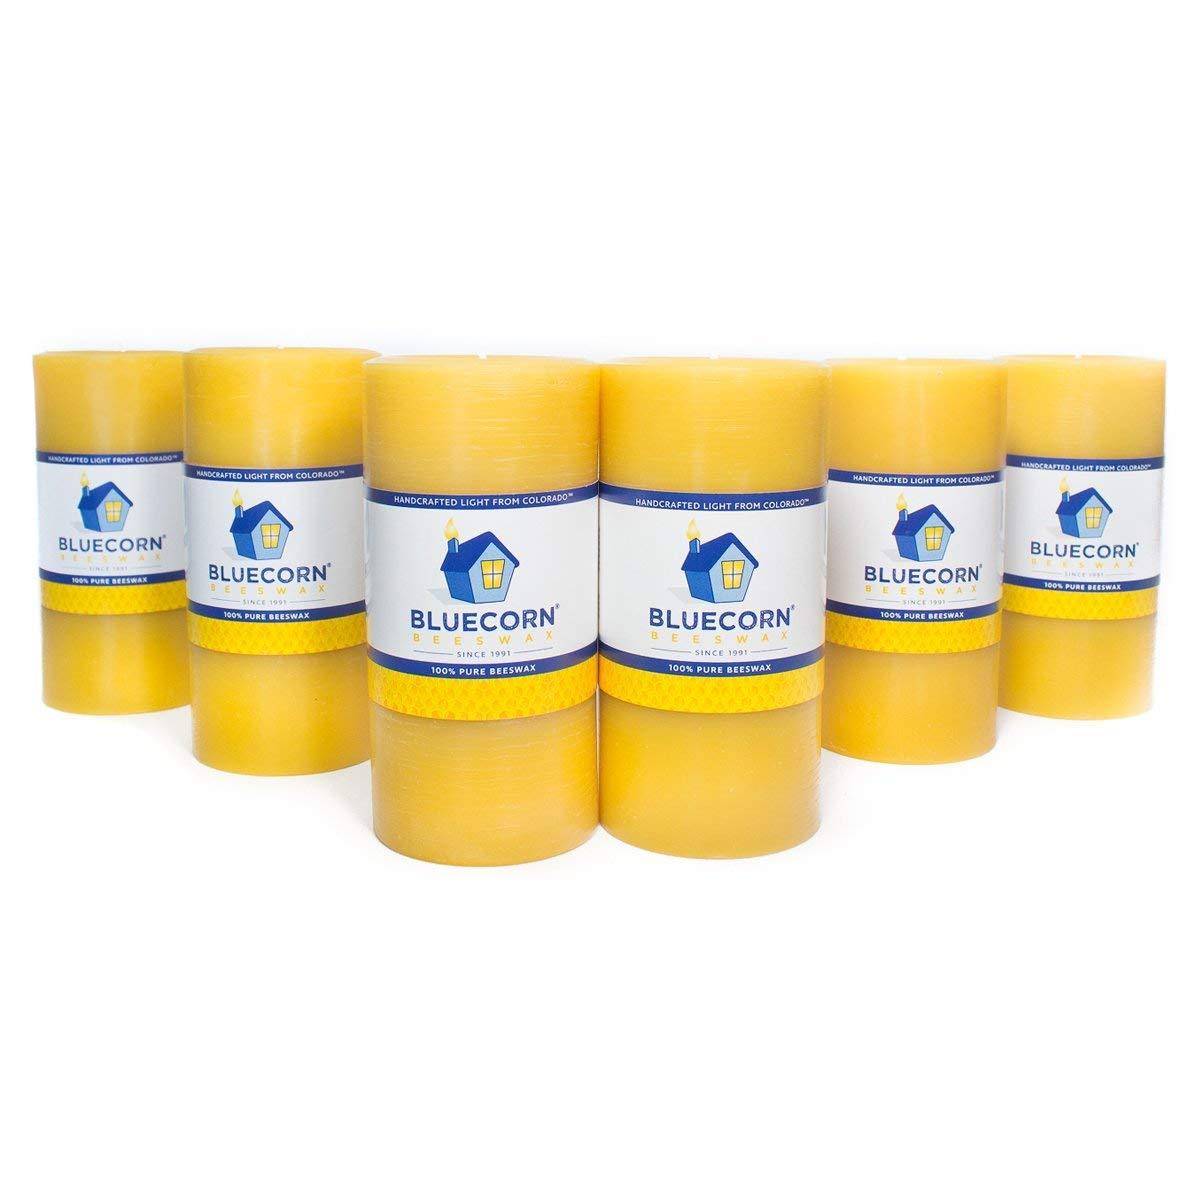 Bluecorn Beeswax 100% Pure Raw Wax Pillars: Case (6) 3''x 6'' (Save 10%)